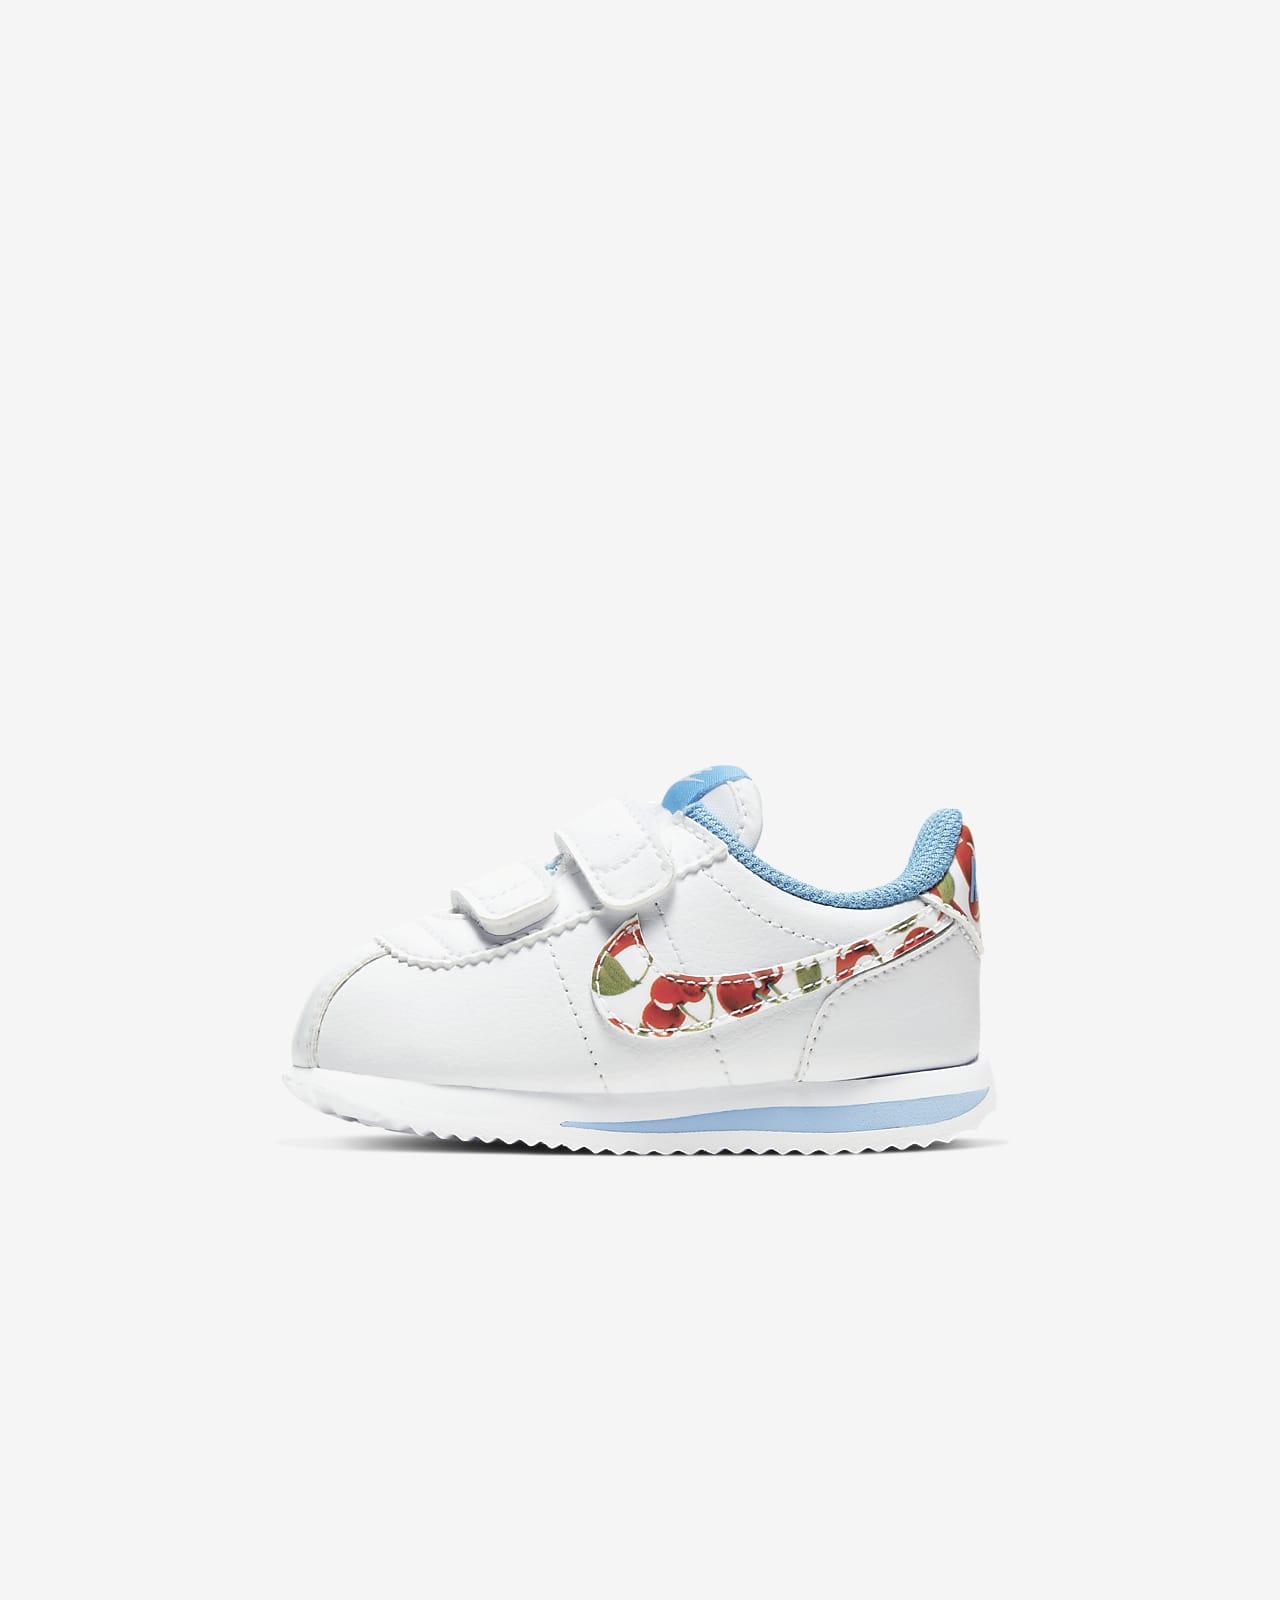 Nike Cortez Basic SL SE BTV 婴童运动童鞋